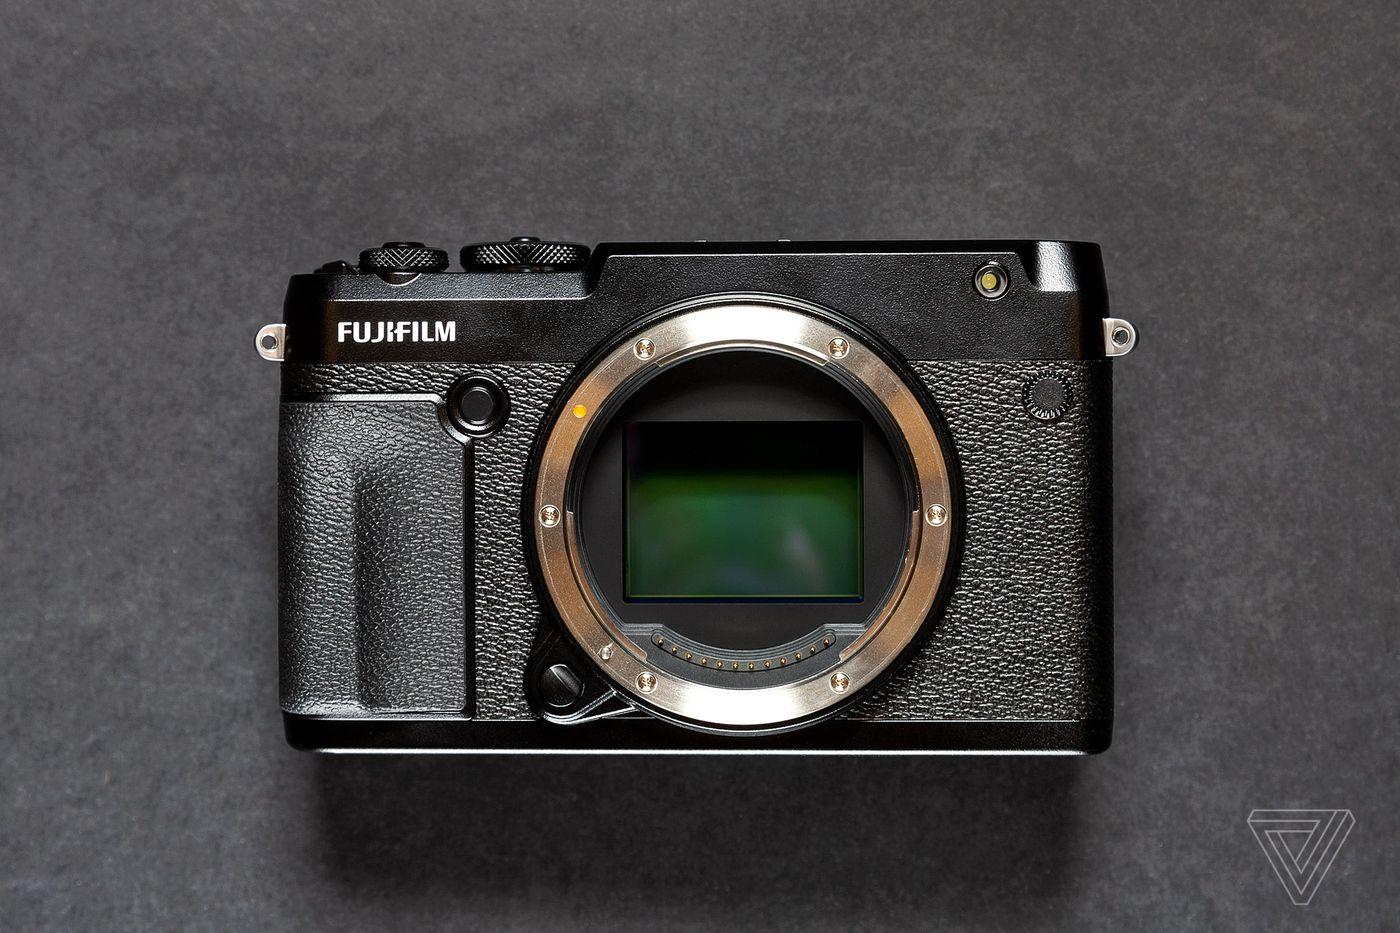 Fujifilm GFX 50R medium format camera review: bigger isn't always